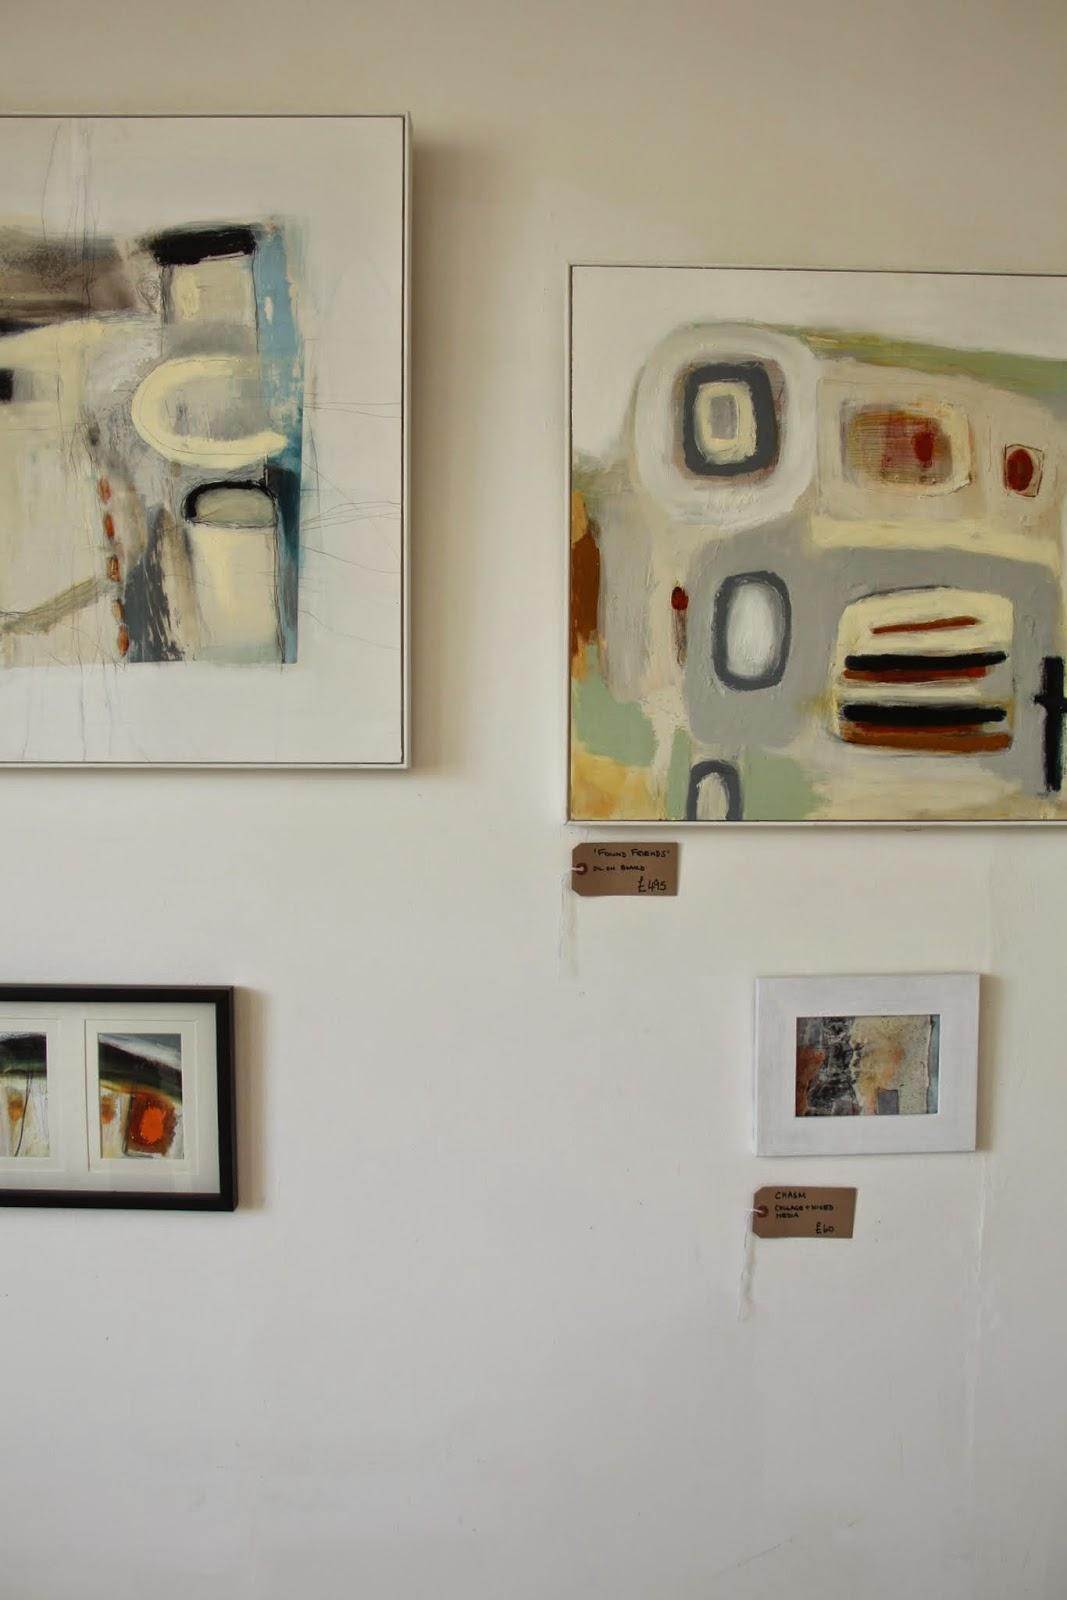 liz meier artist, commercial square studios, trend daily blog, caroline davis